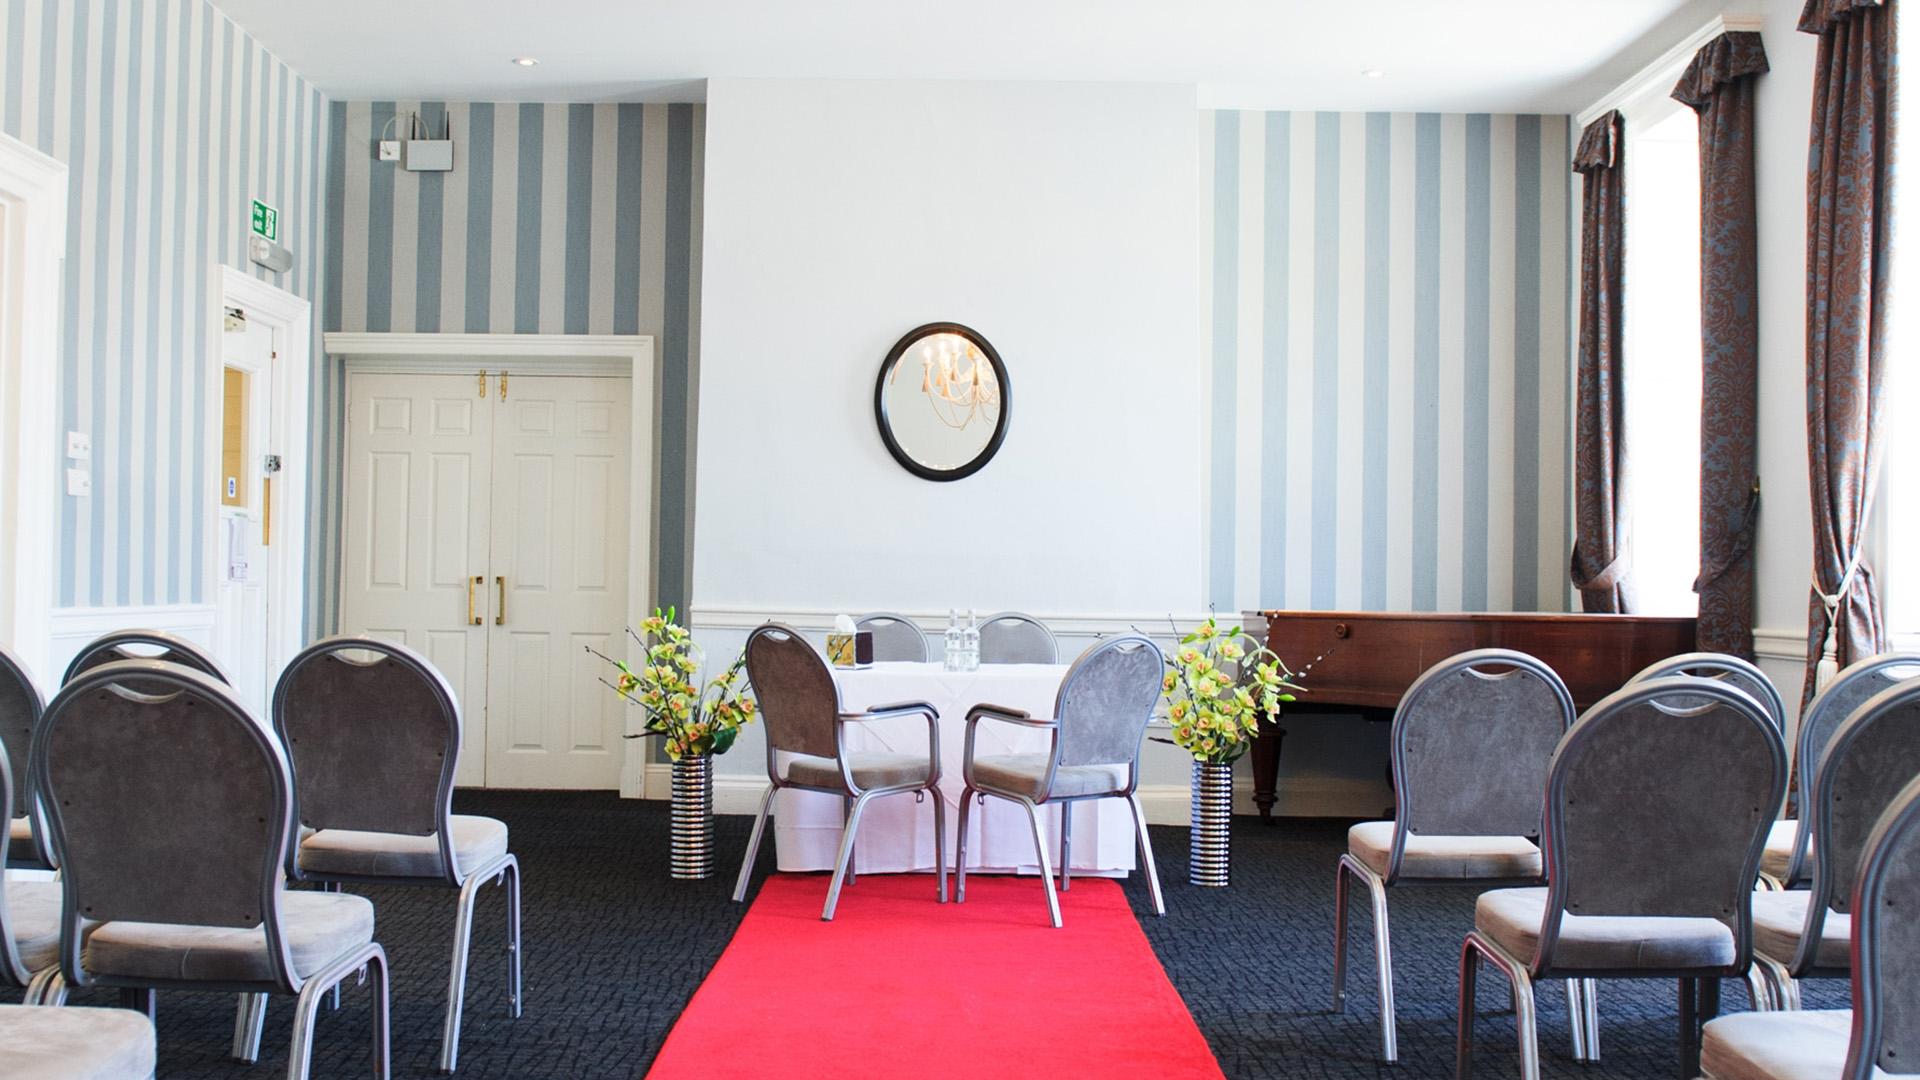 Wedding Venues in Hampshire Mercure Southampton Centre Dolphin Hotel Grand Affair 18